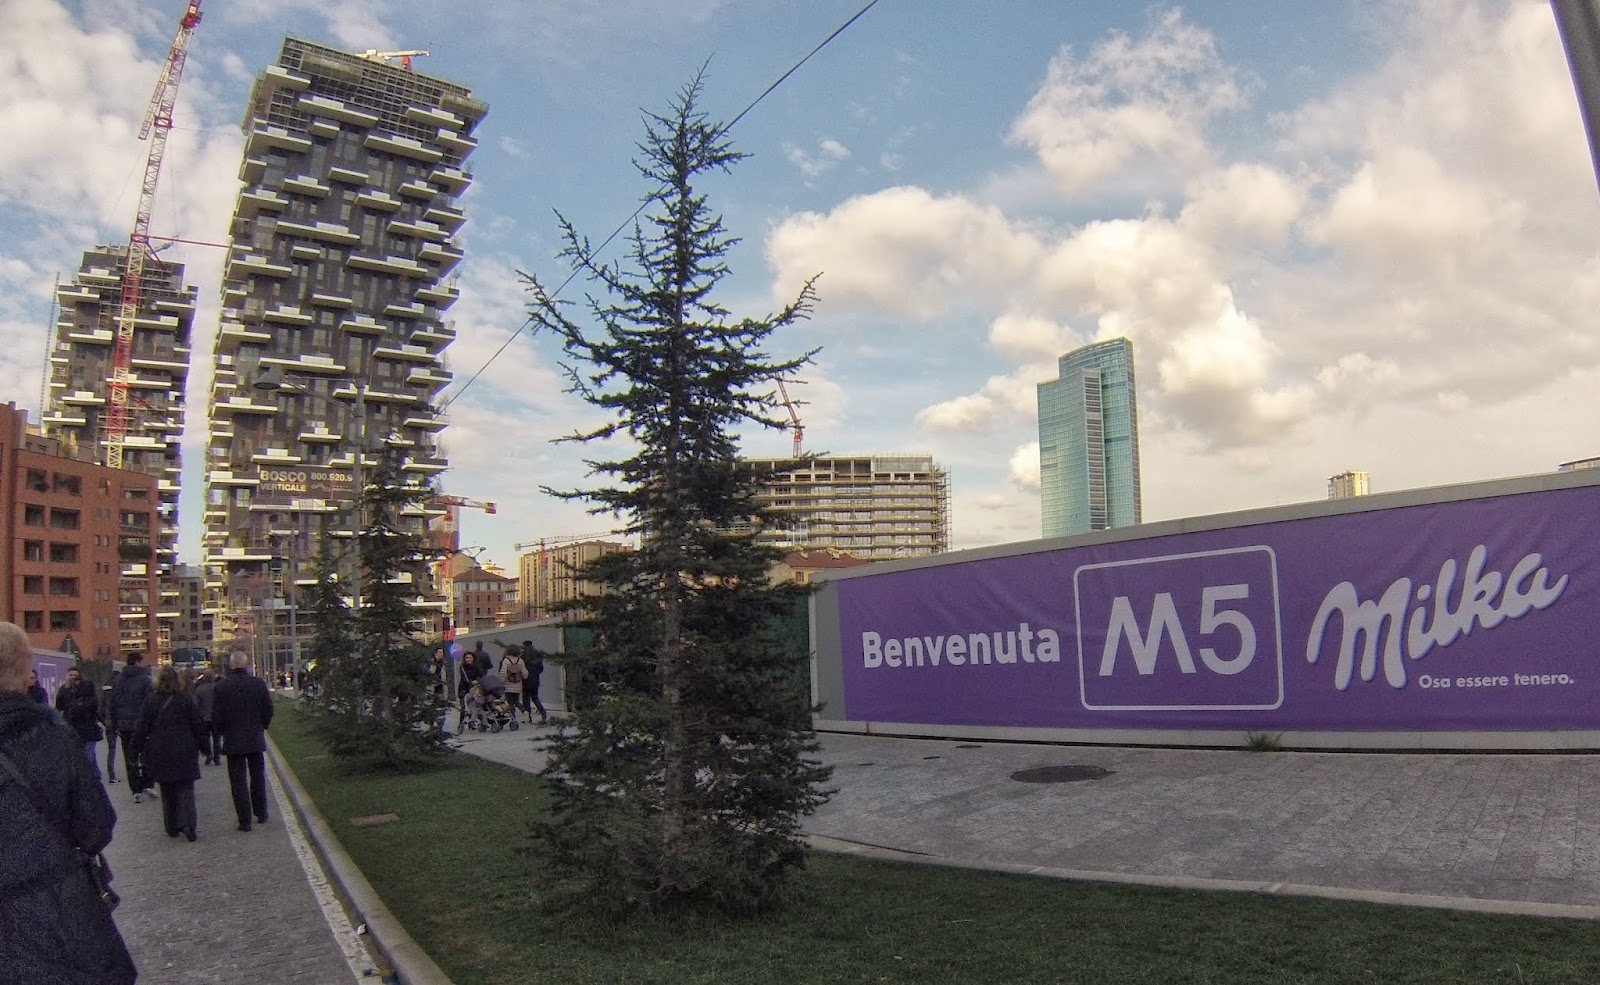 Milano porta garibaldi hub metropolitano journeyers il - Porta garibaldi malpensa terminal 2 ...